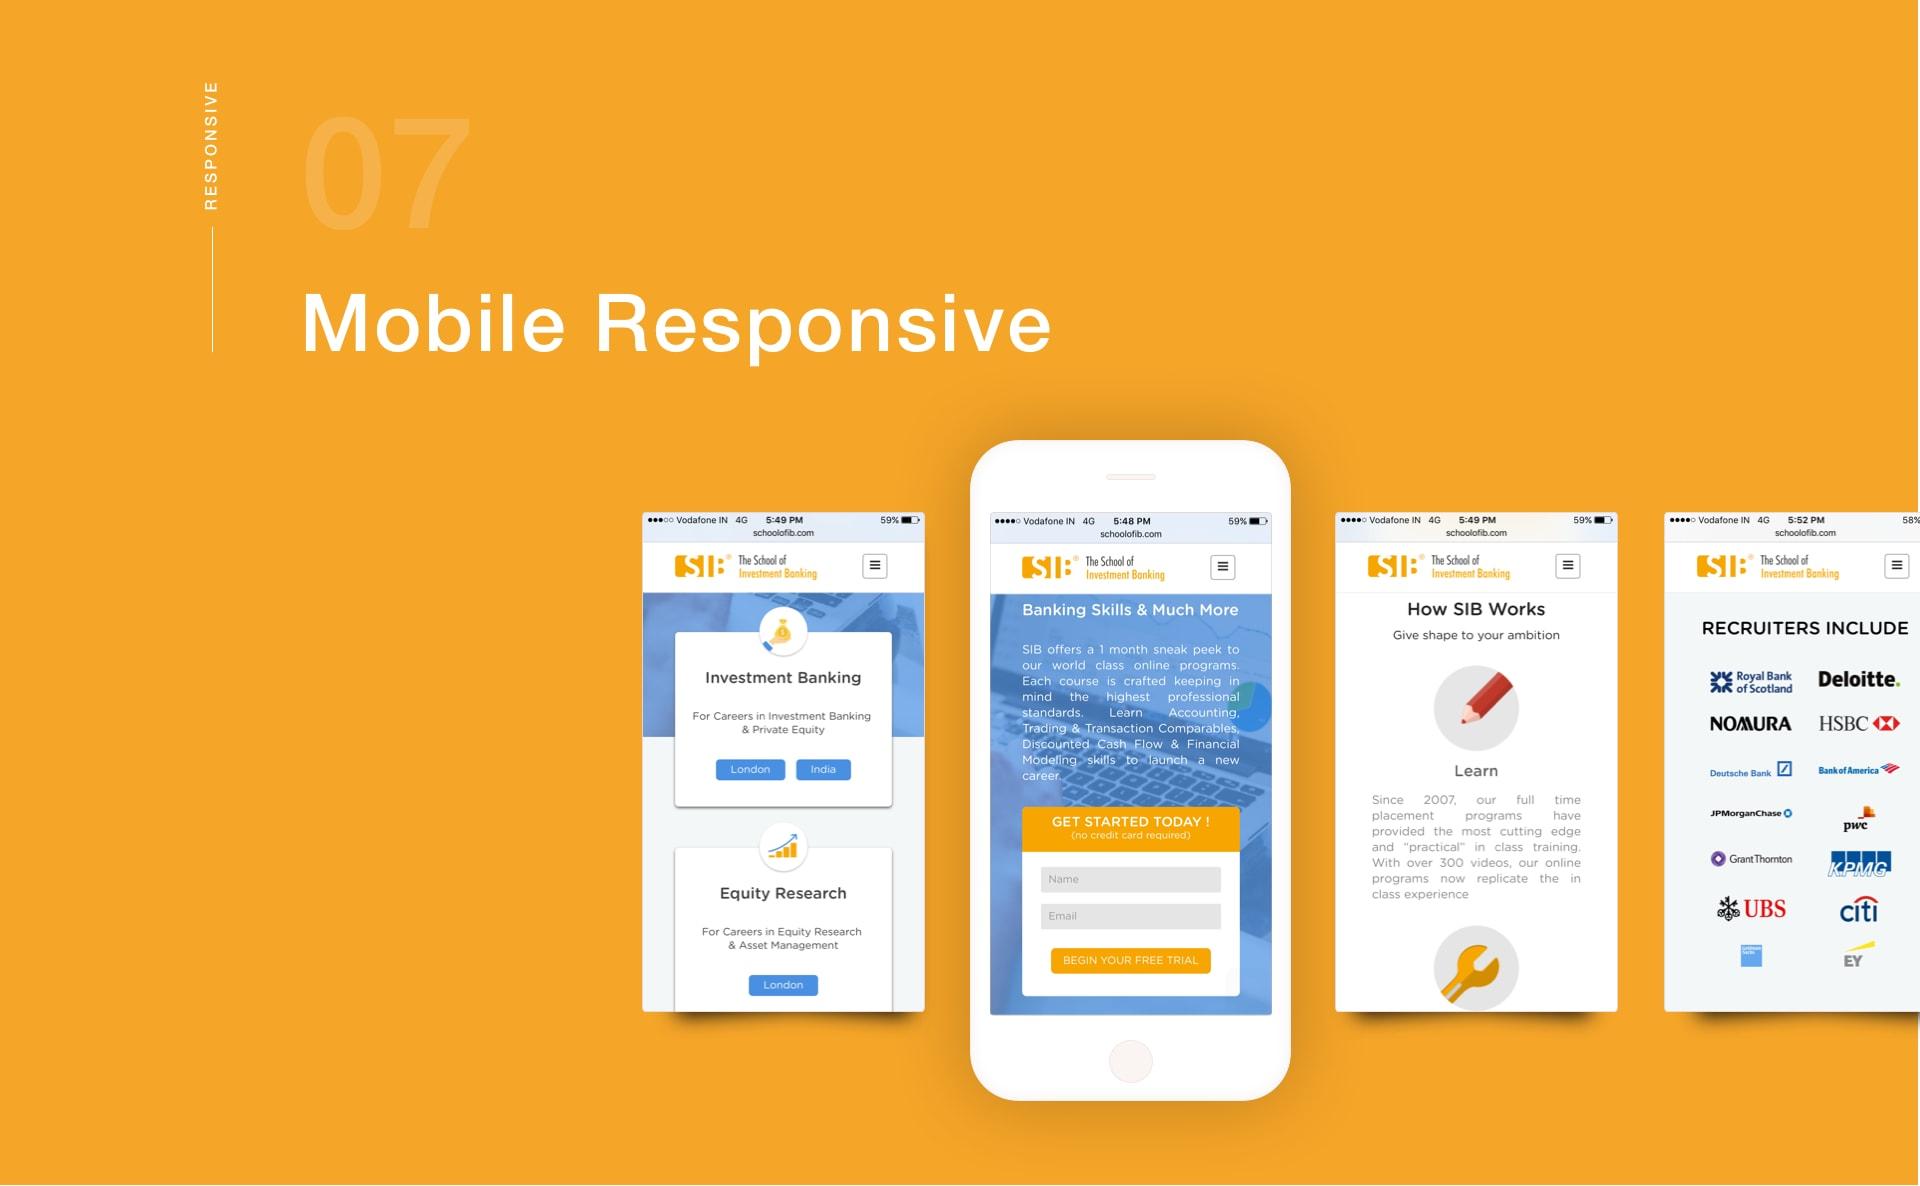 Mobile Responsive